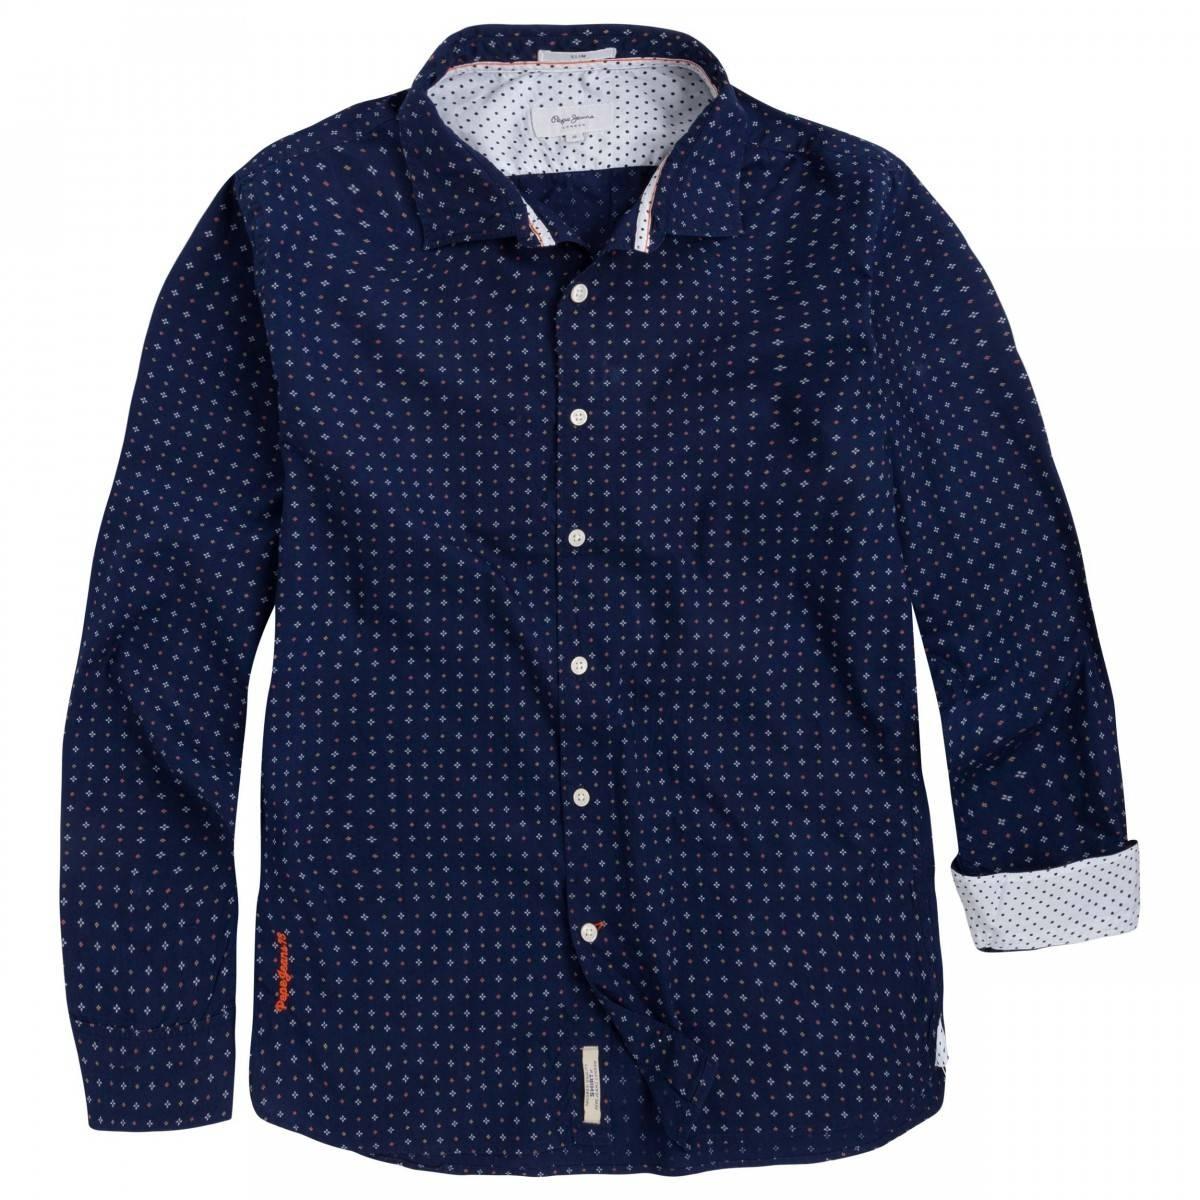 Image result for chemise homme